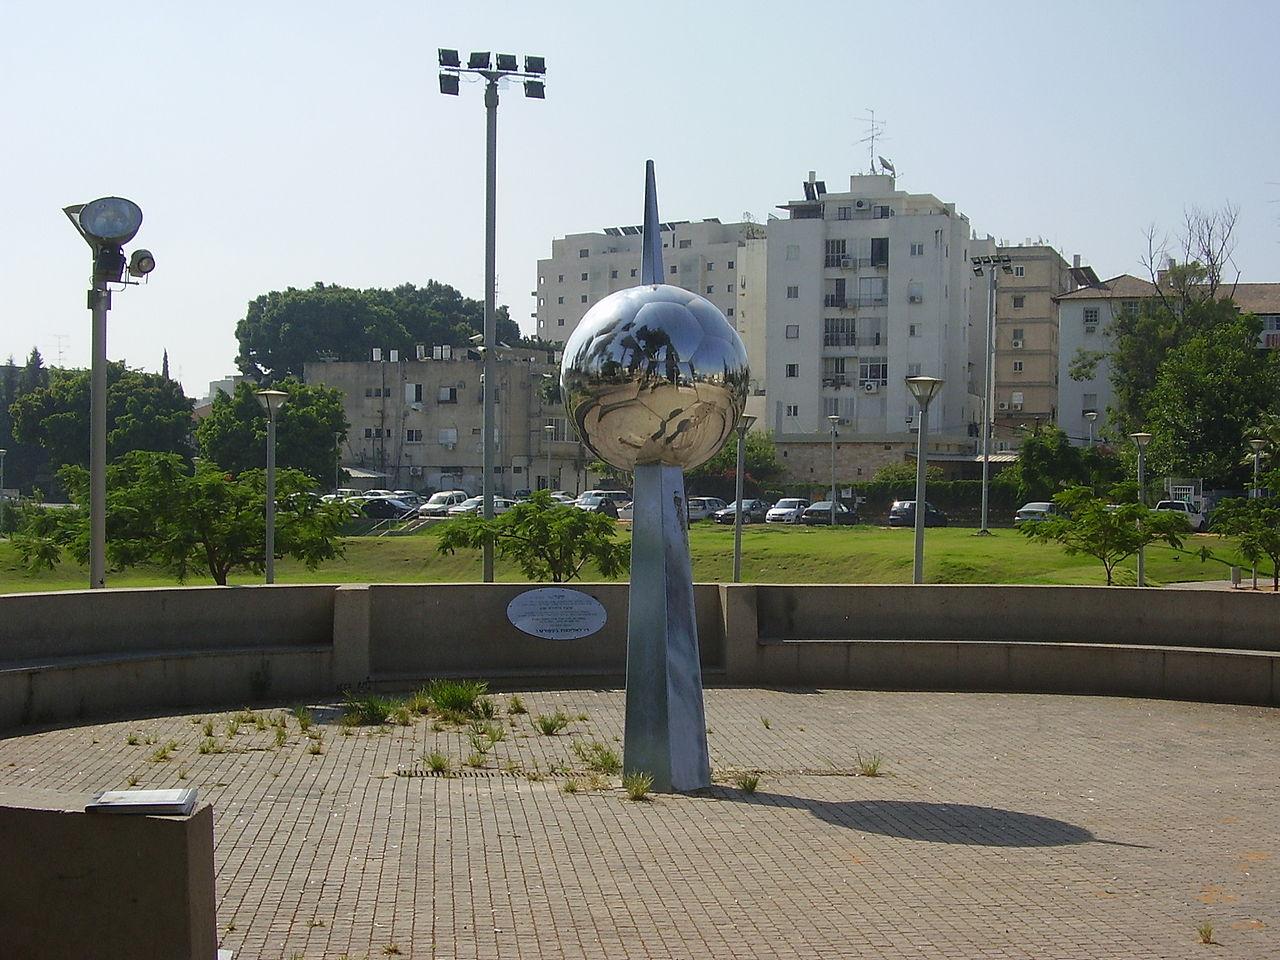 Rehovot Israel  city images : לקובץ המקורי  2,048 × 1,536 פיקסלים, גודל ...